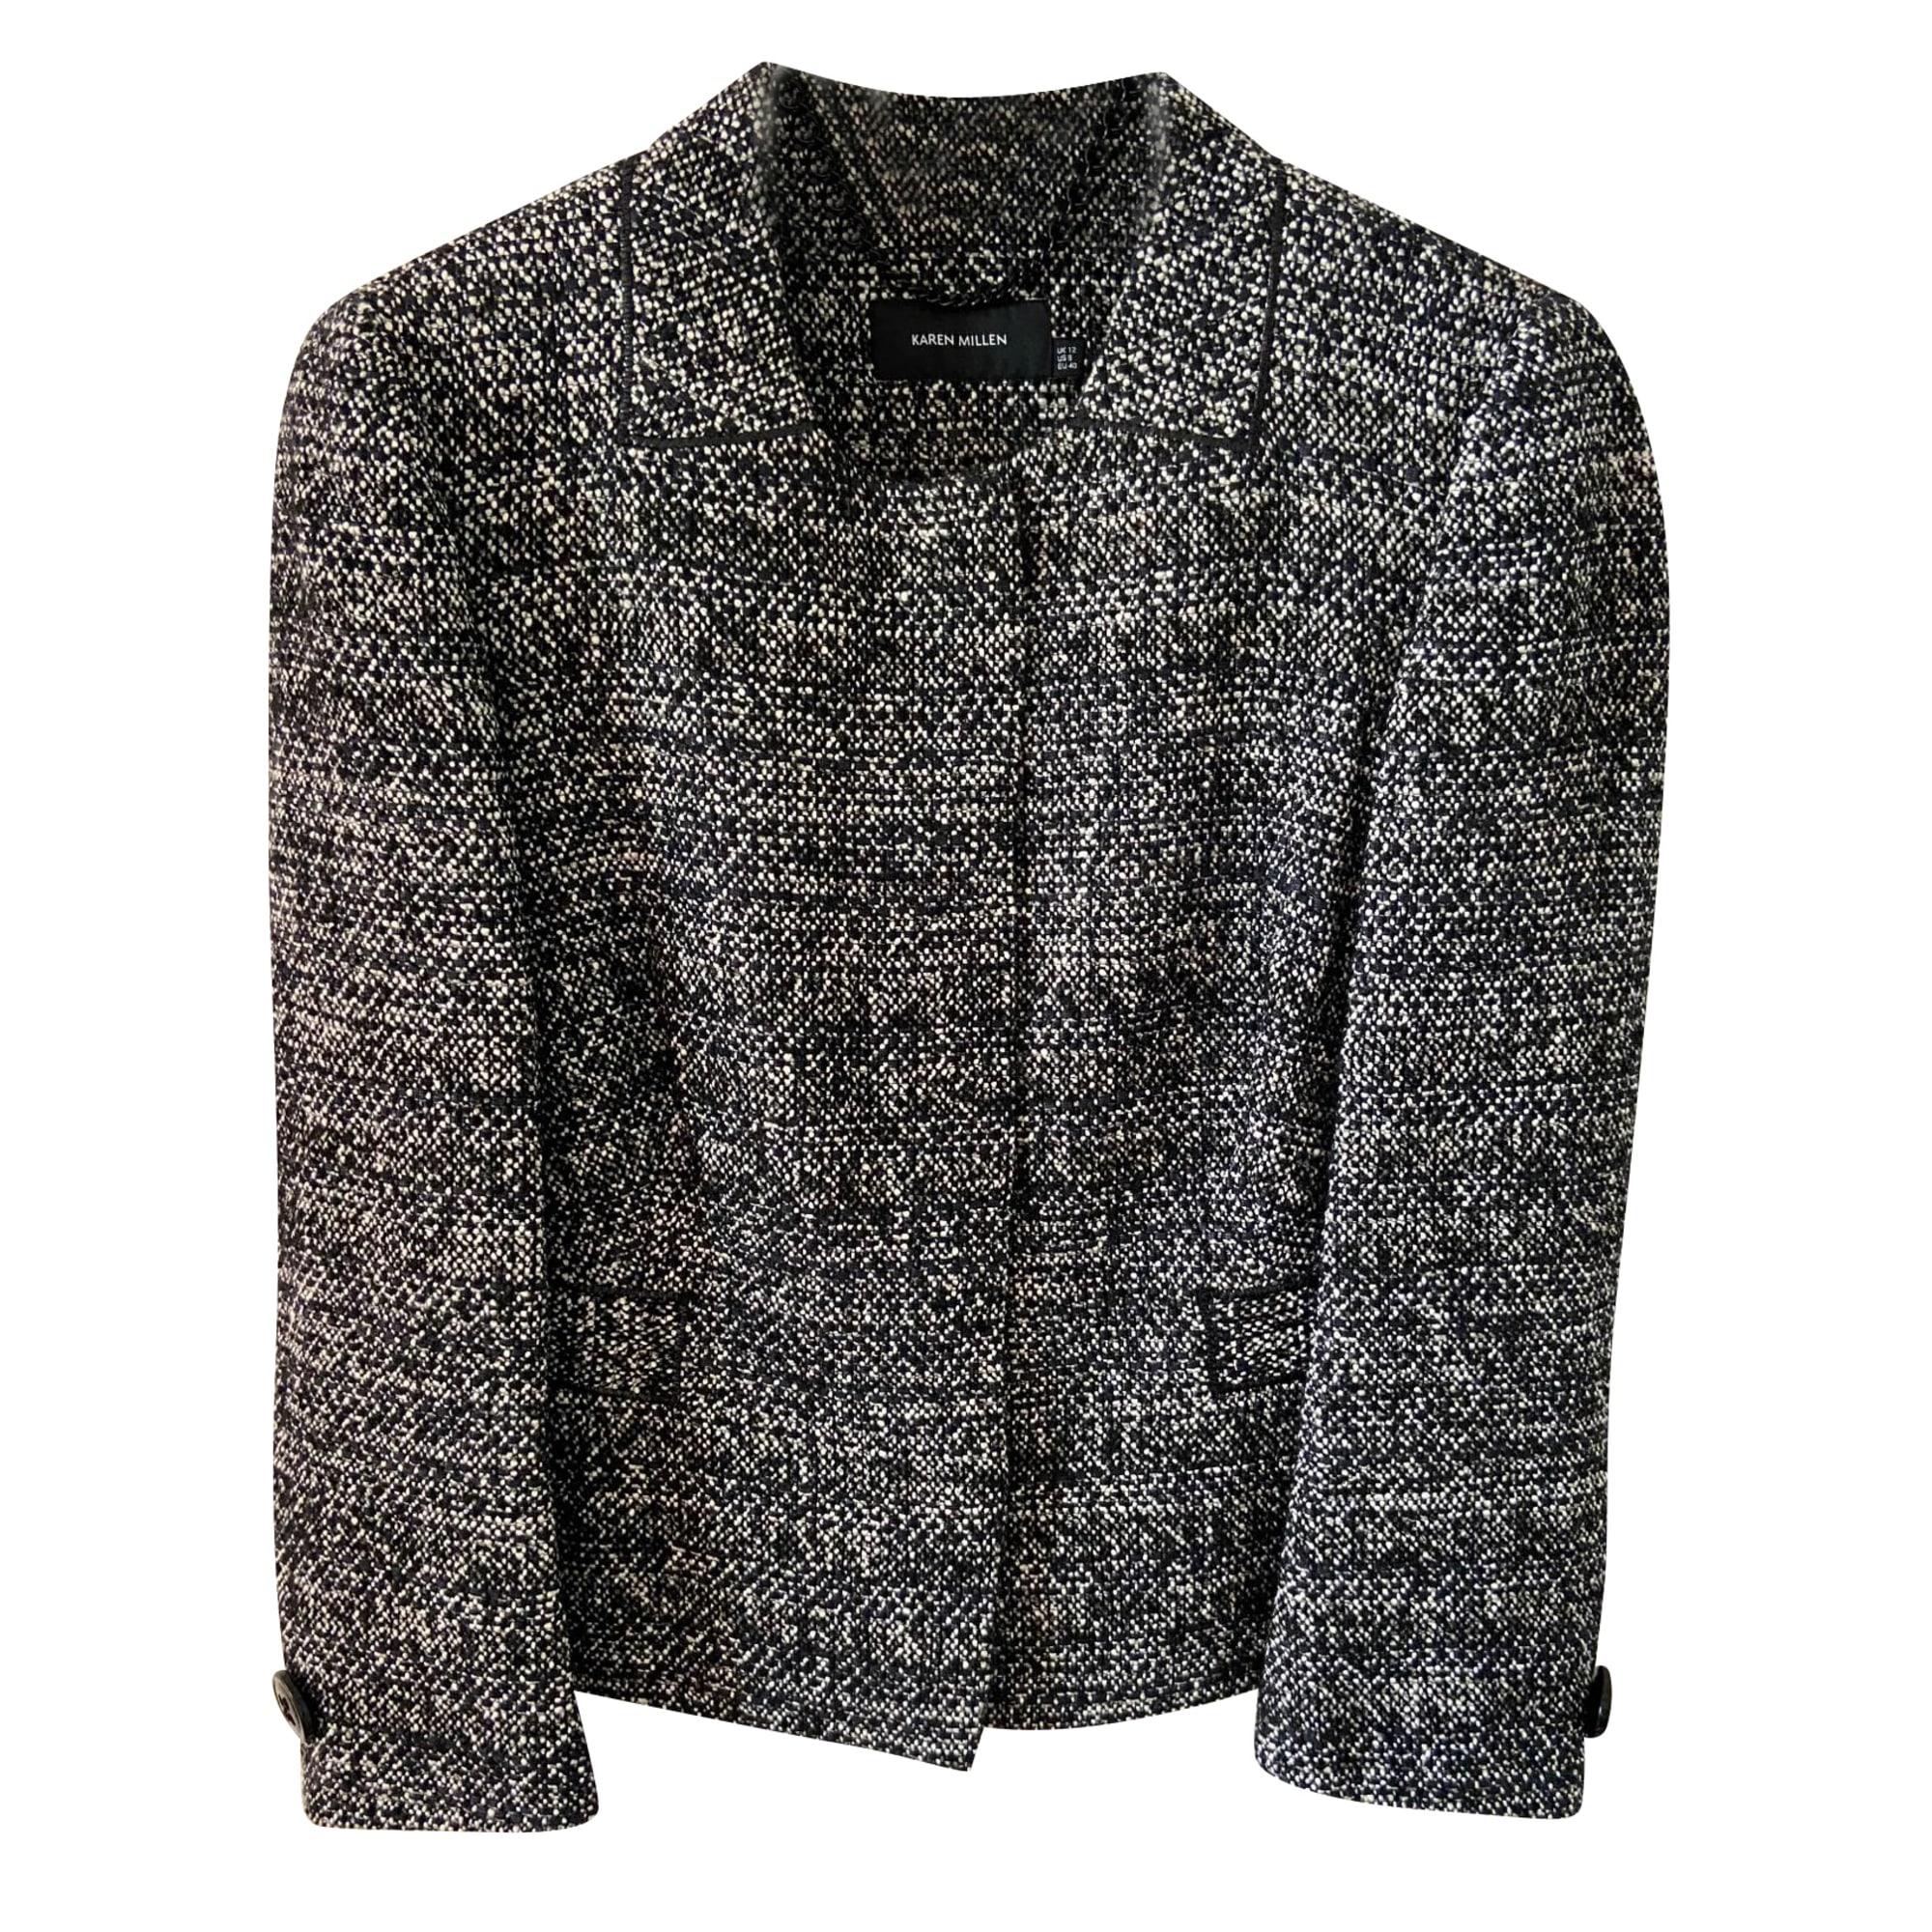 Blazer, veste tailleur KAREN MILLEN Noir